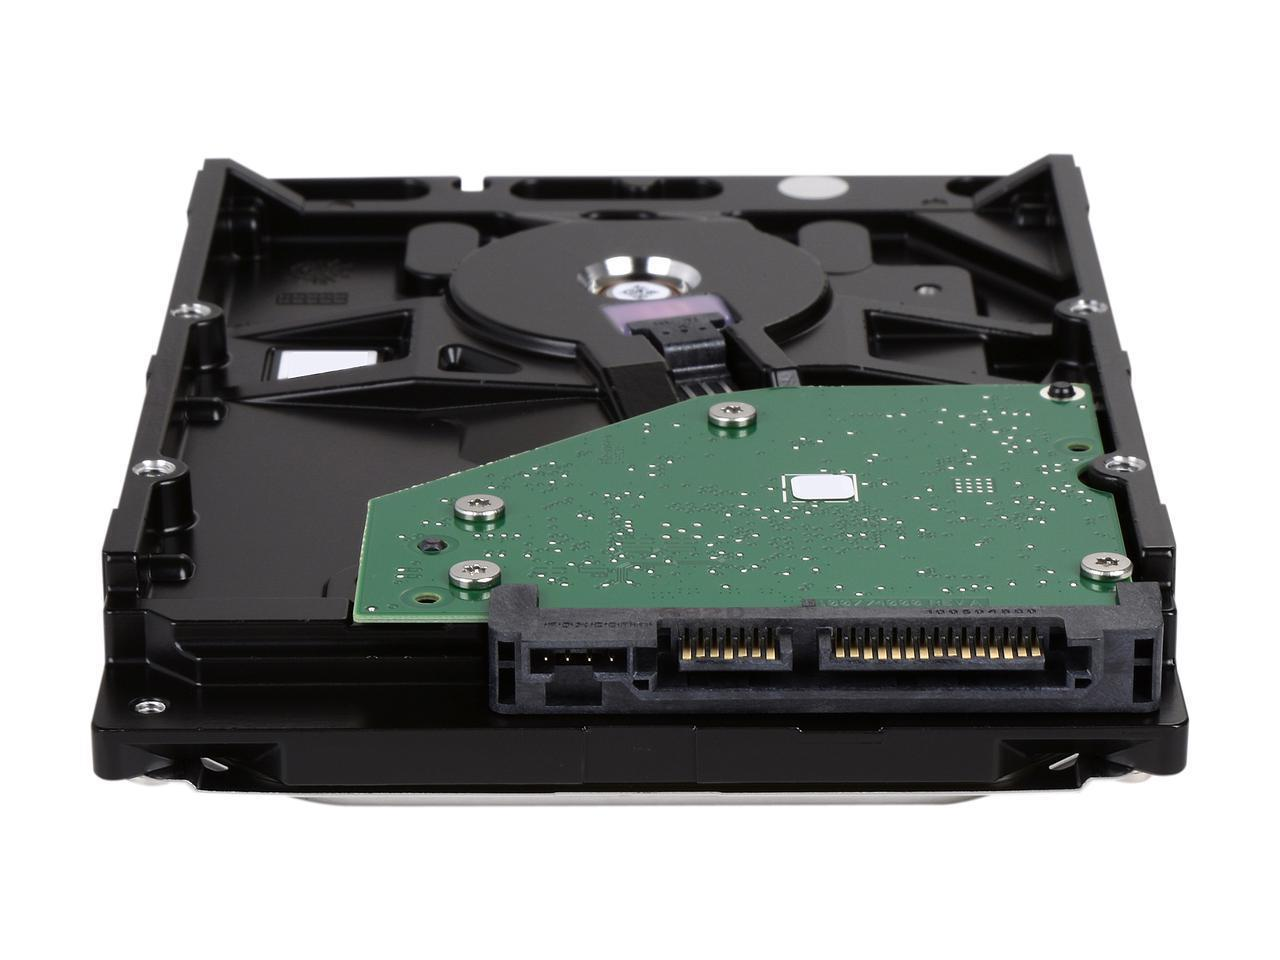 Хард диск SEAGATE SkyHawk ST1000VX005, 1TB, 64MB Cache, SATA 6.0Gb/s-4